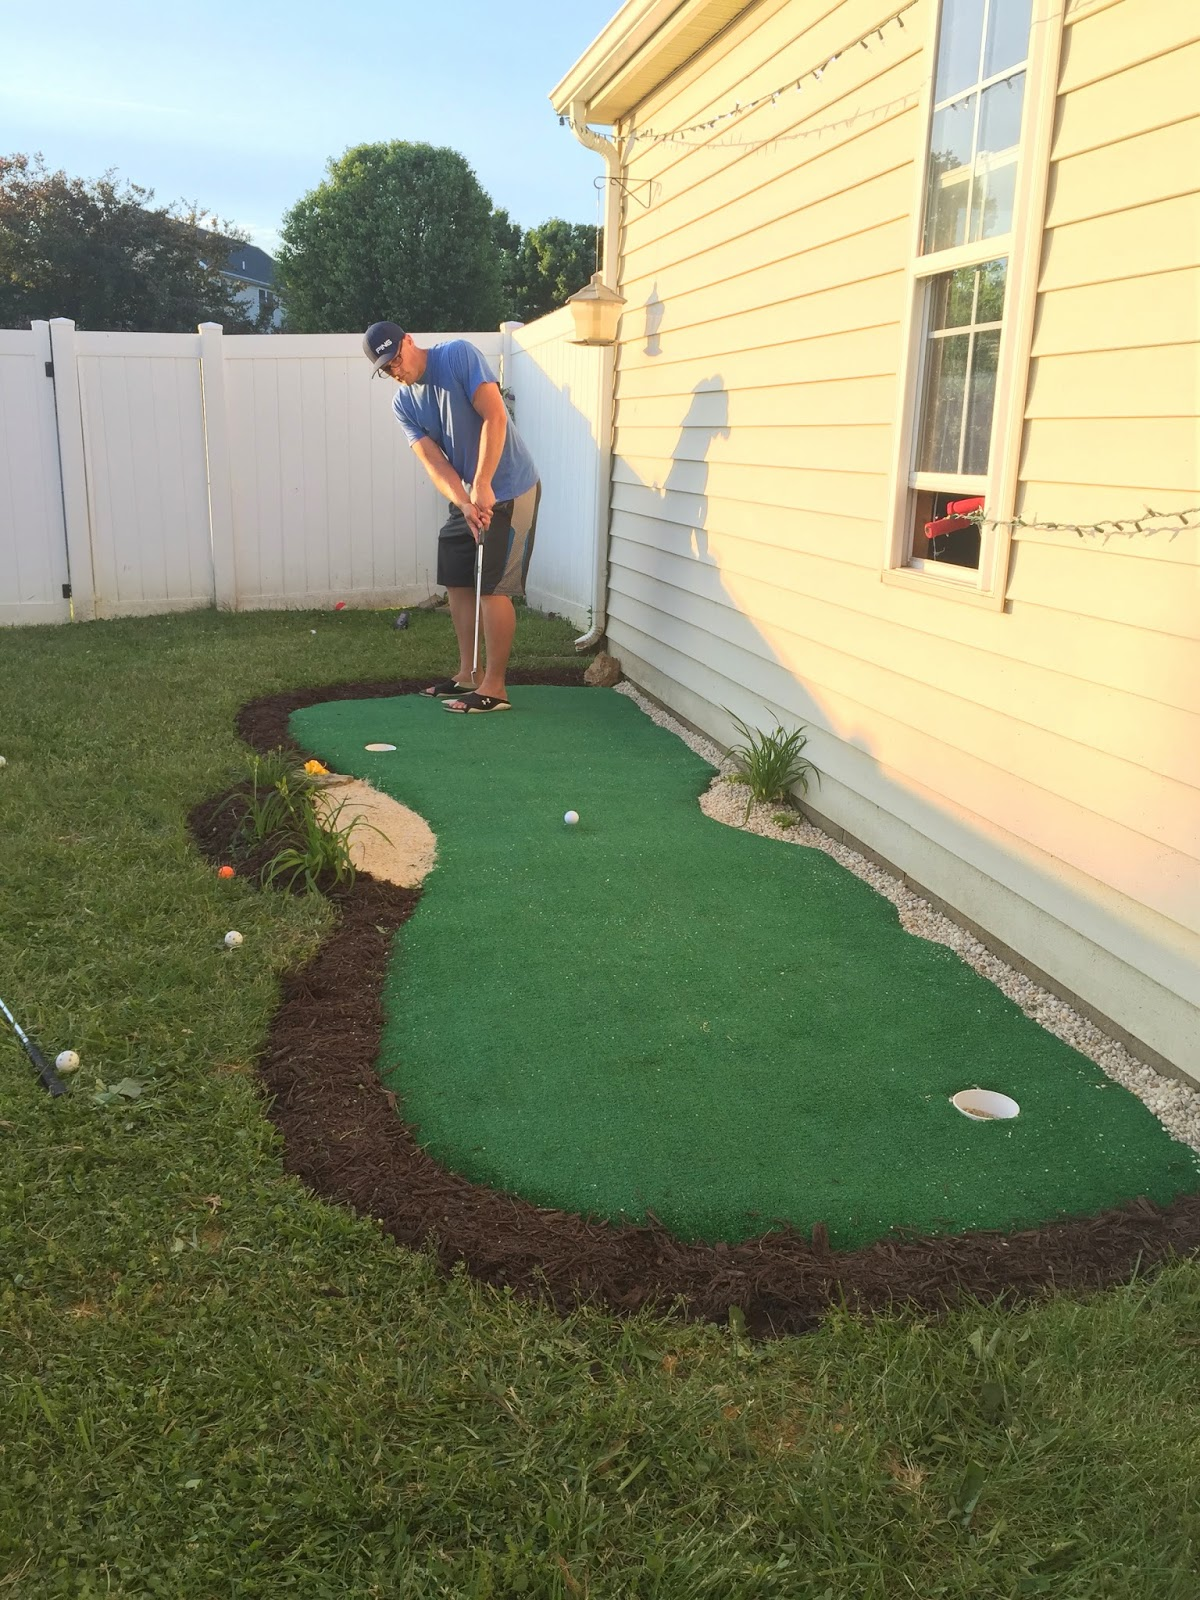 Little Bit Funky: How to make a backyard putting green ...